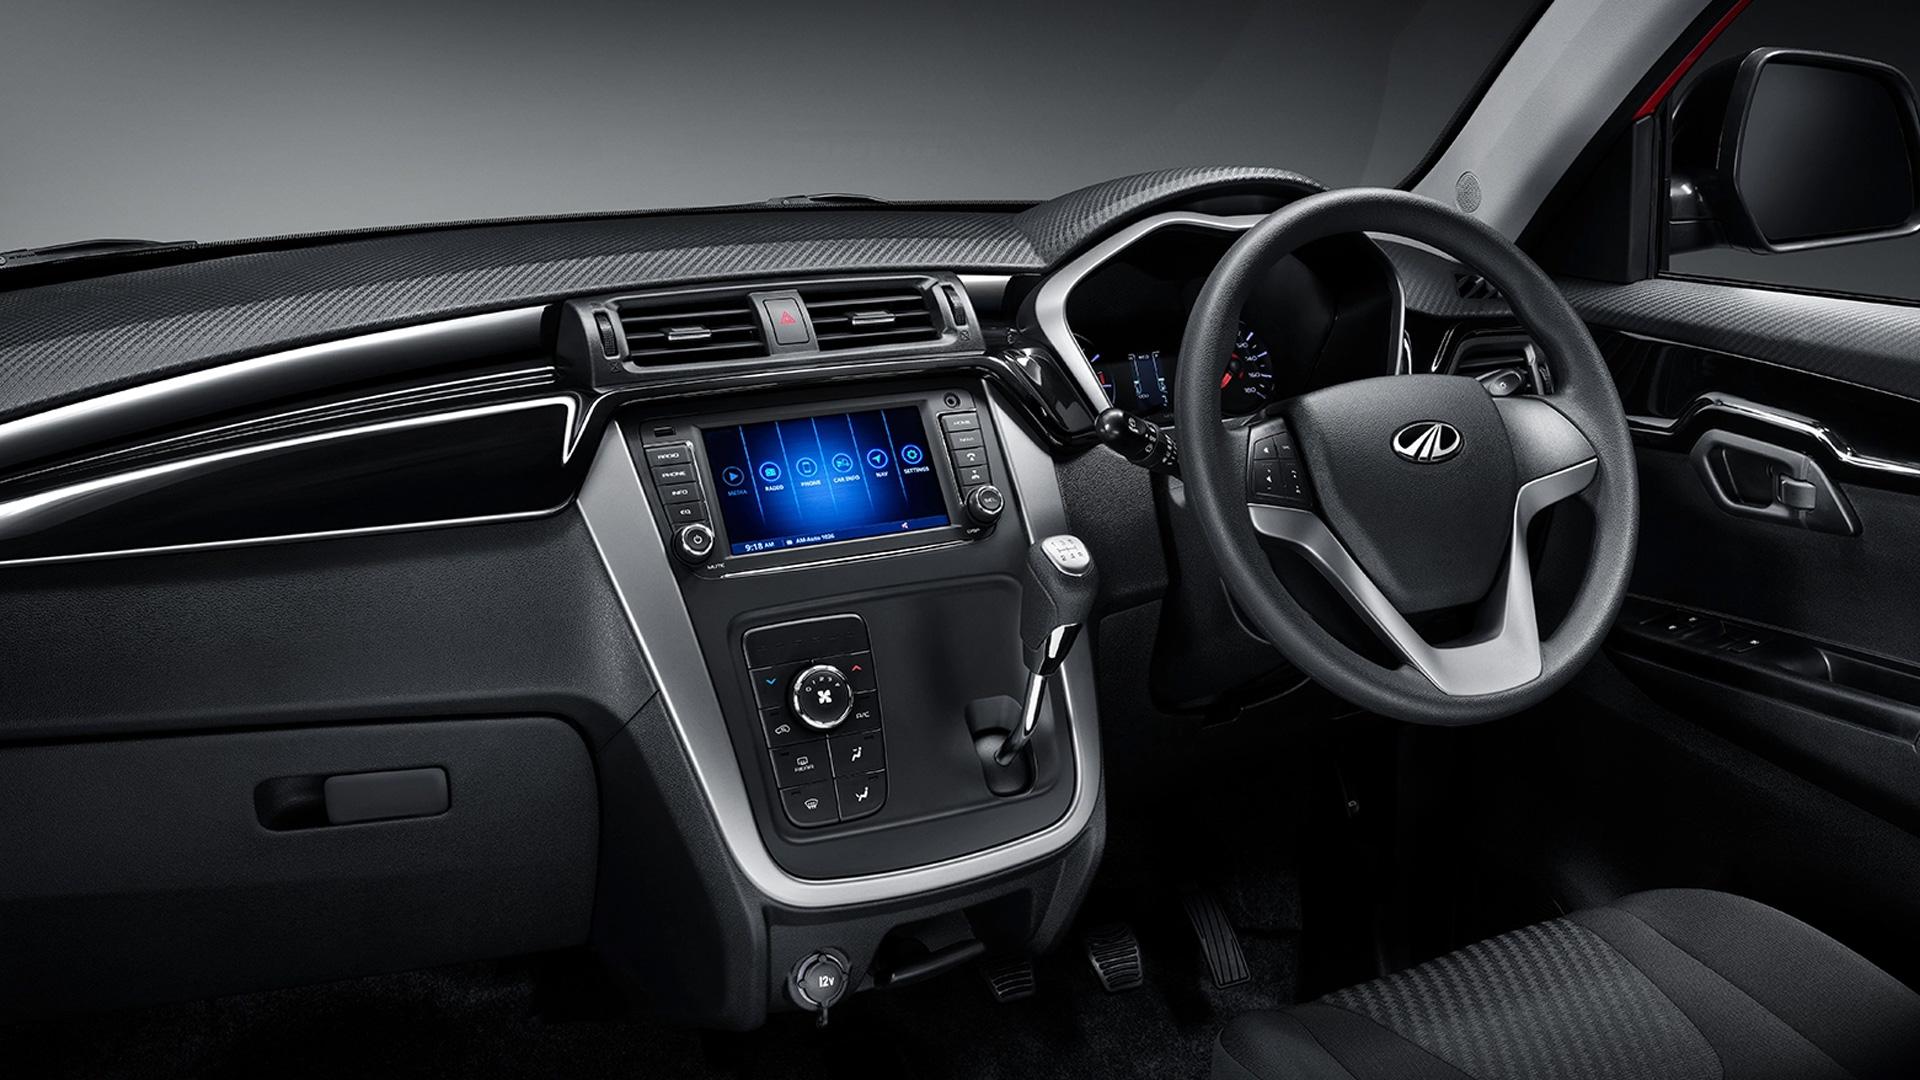 Mahindra KUV 100 nxt 2020 K8 Petrol 6 Str Exterior